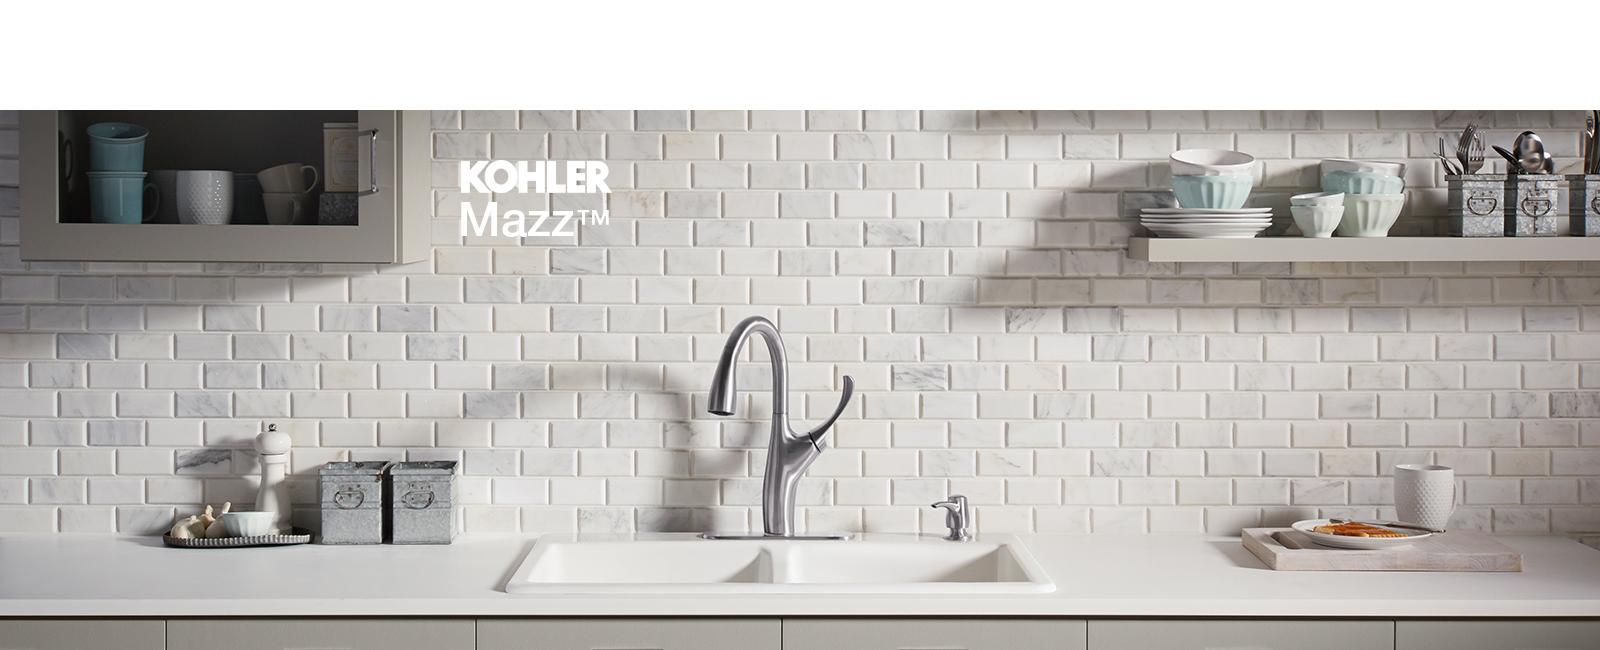 Kohler Mazz Kitchen pull down Faucet - Kloop Studio